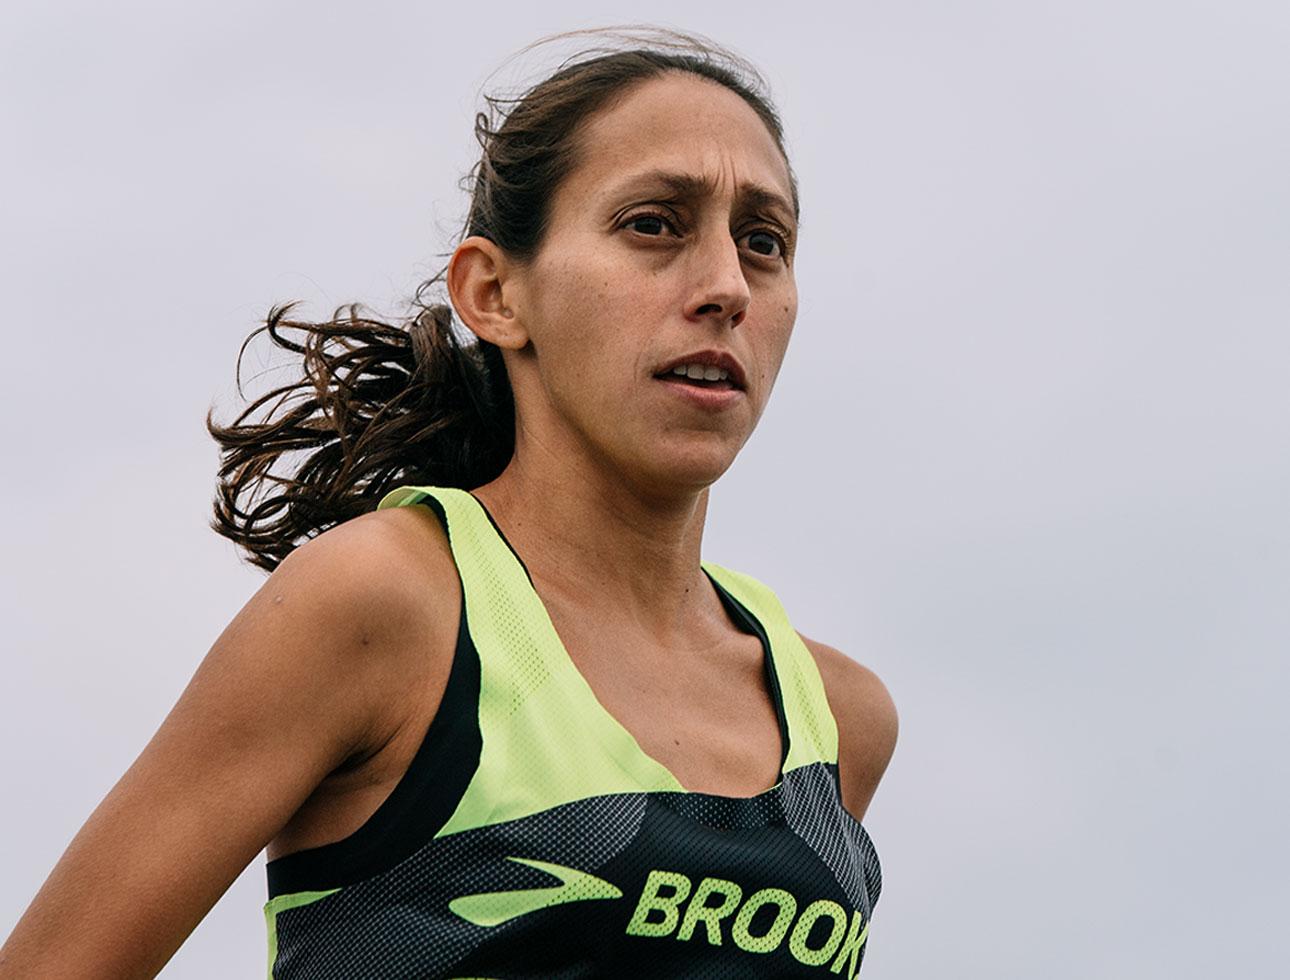 Brooks pro marathoner Des Linden